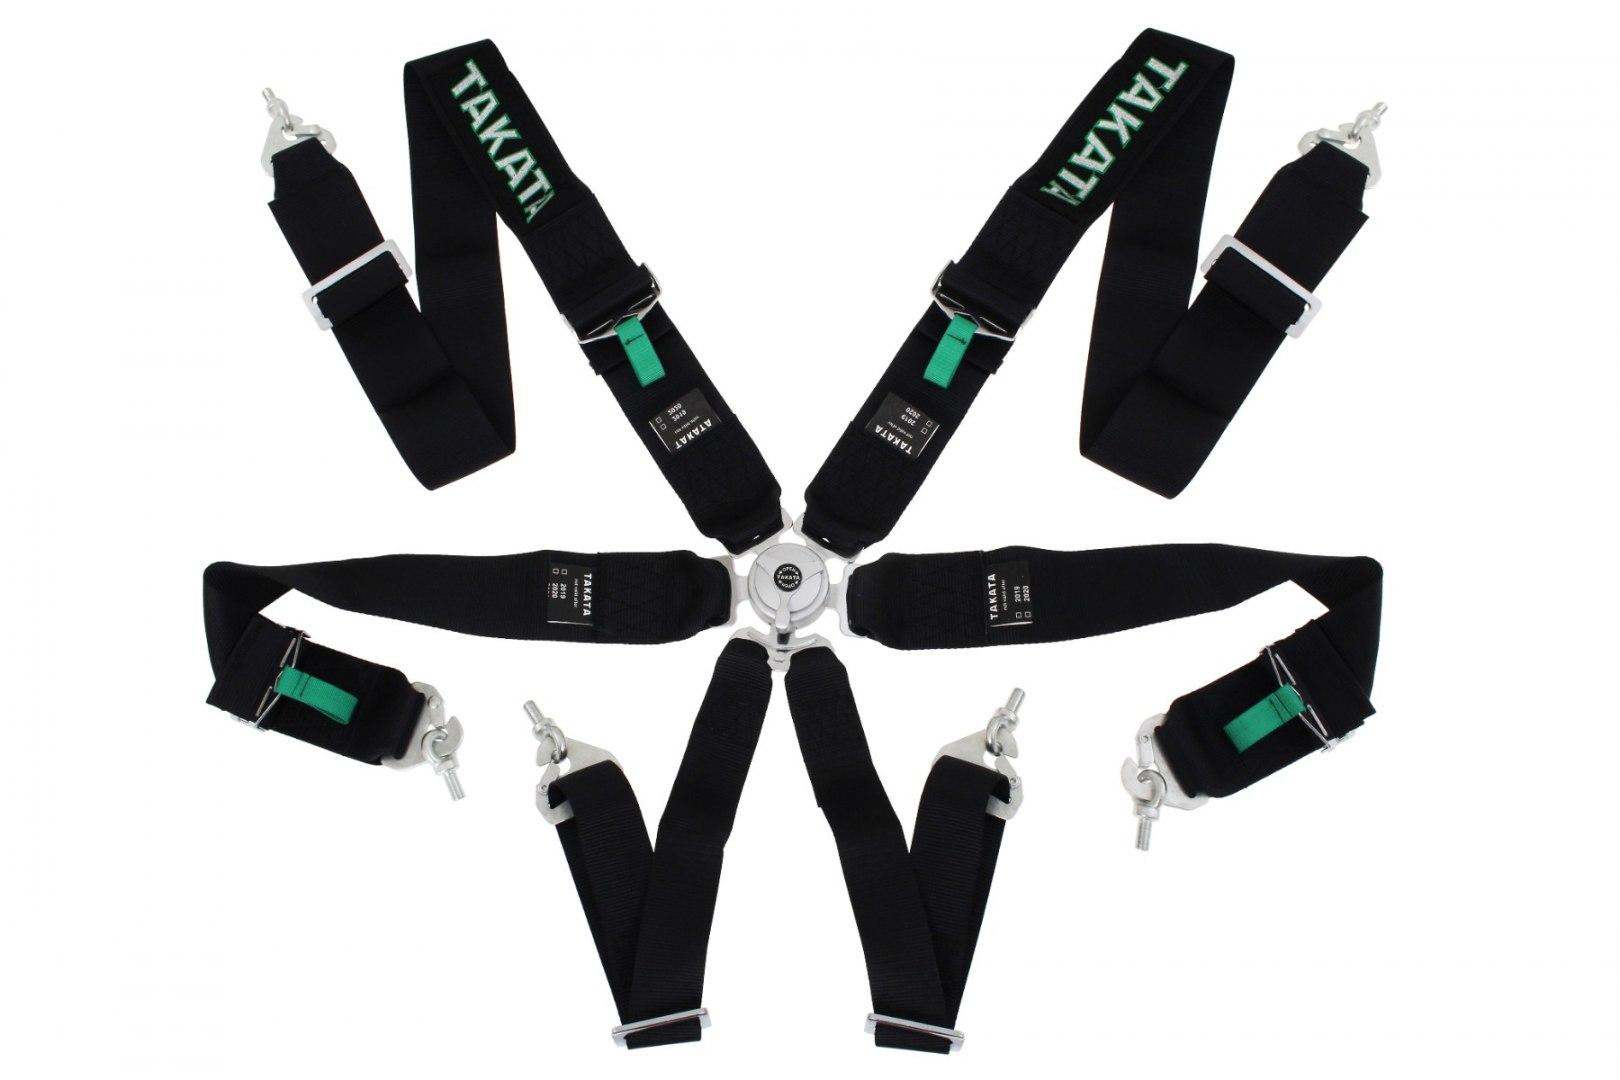 "Pasy sportowe 6p 3"" Black - Takata Replica harness - GRUBYGARAGE - Sklep Tuningowy"